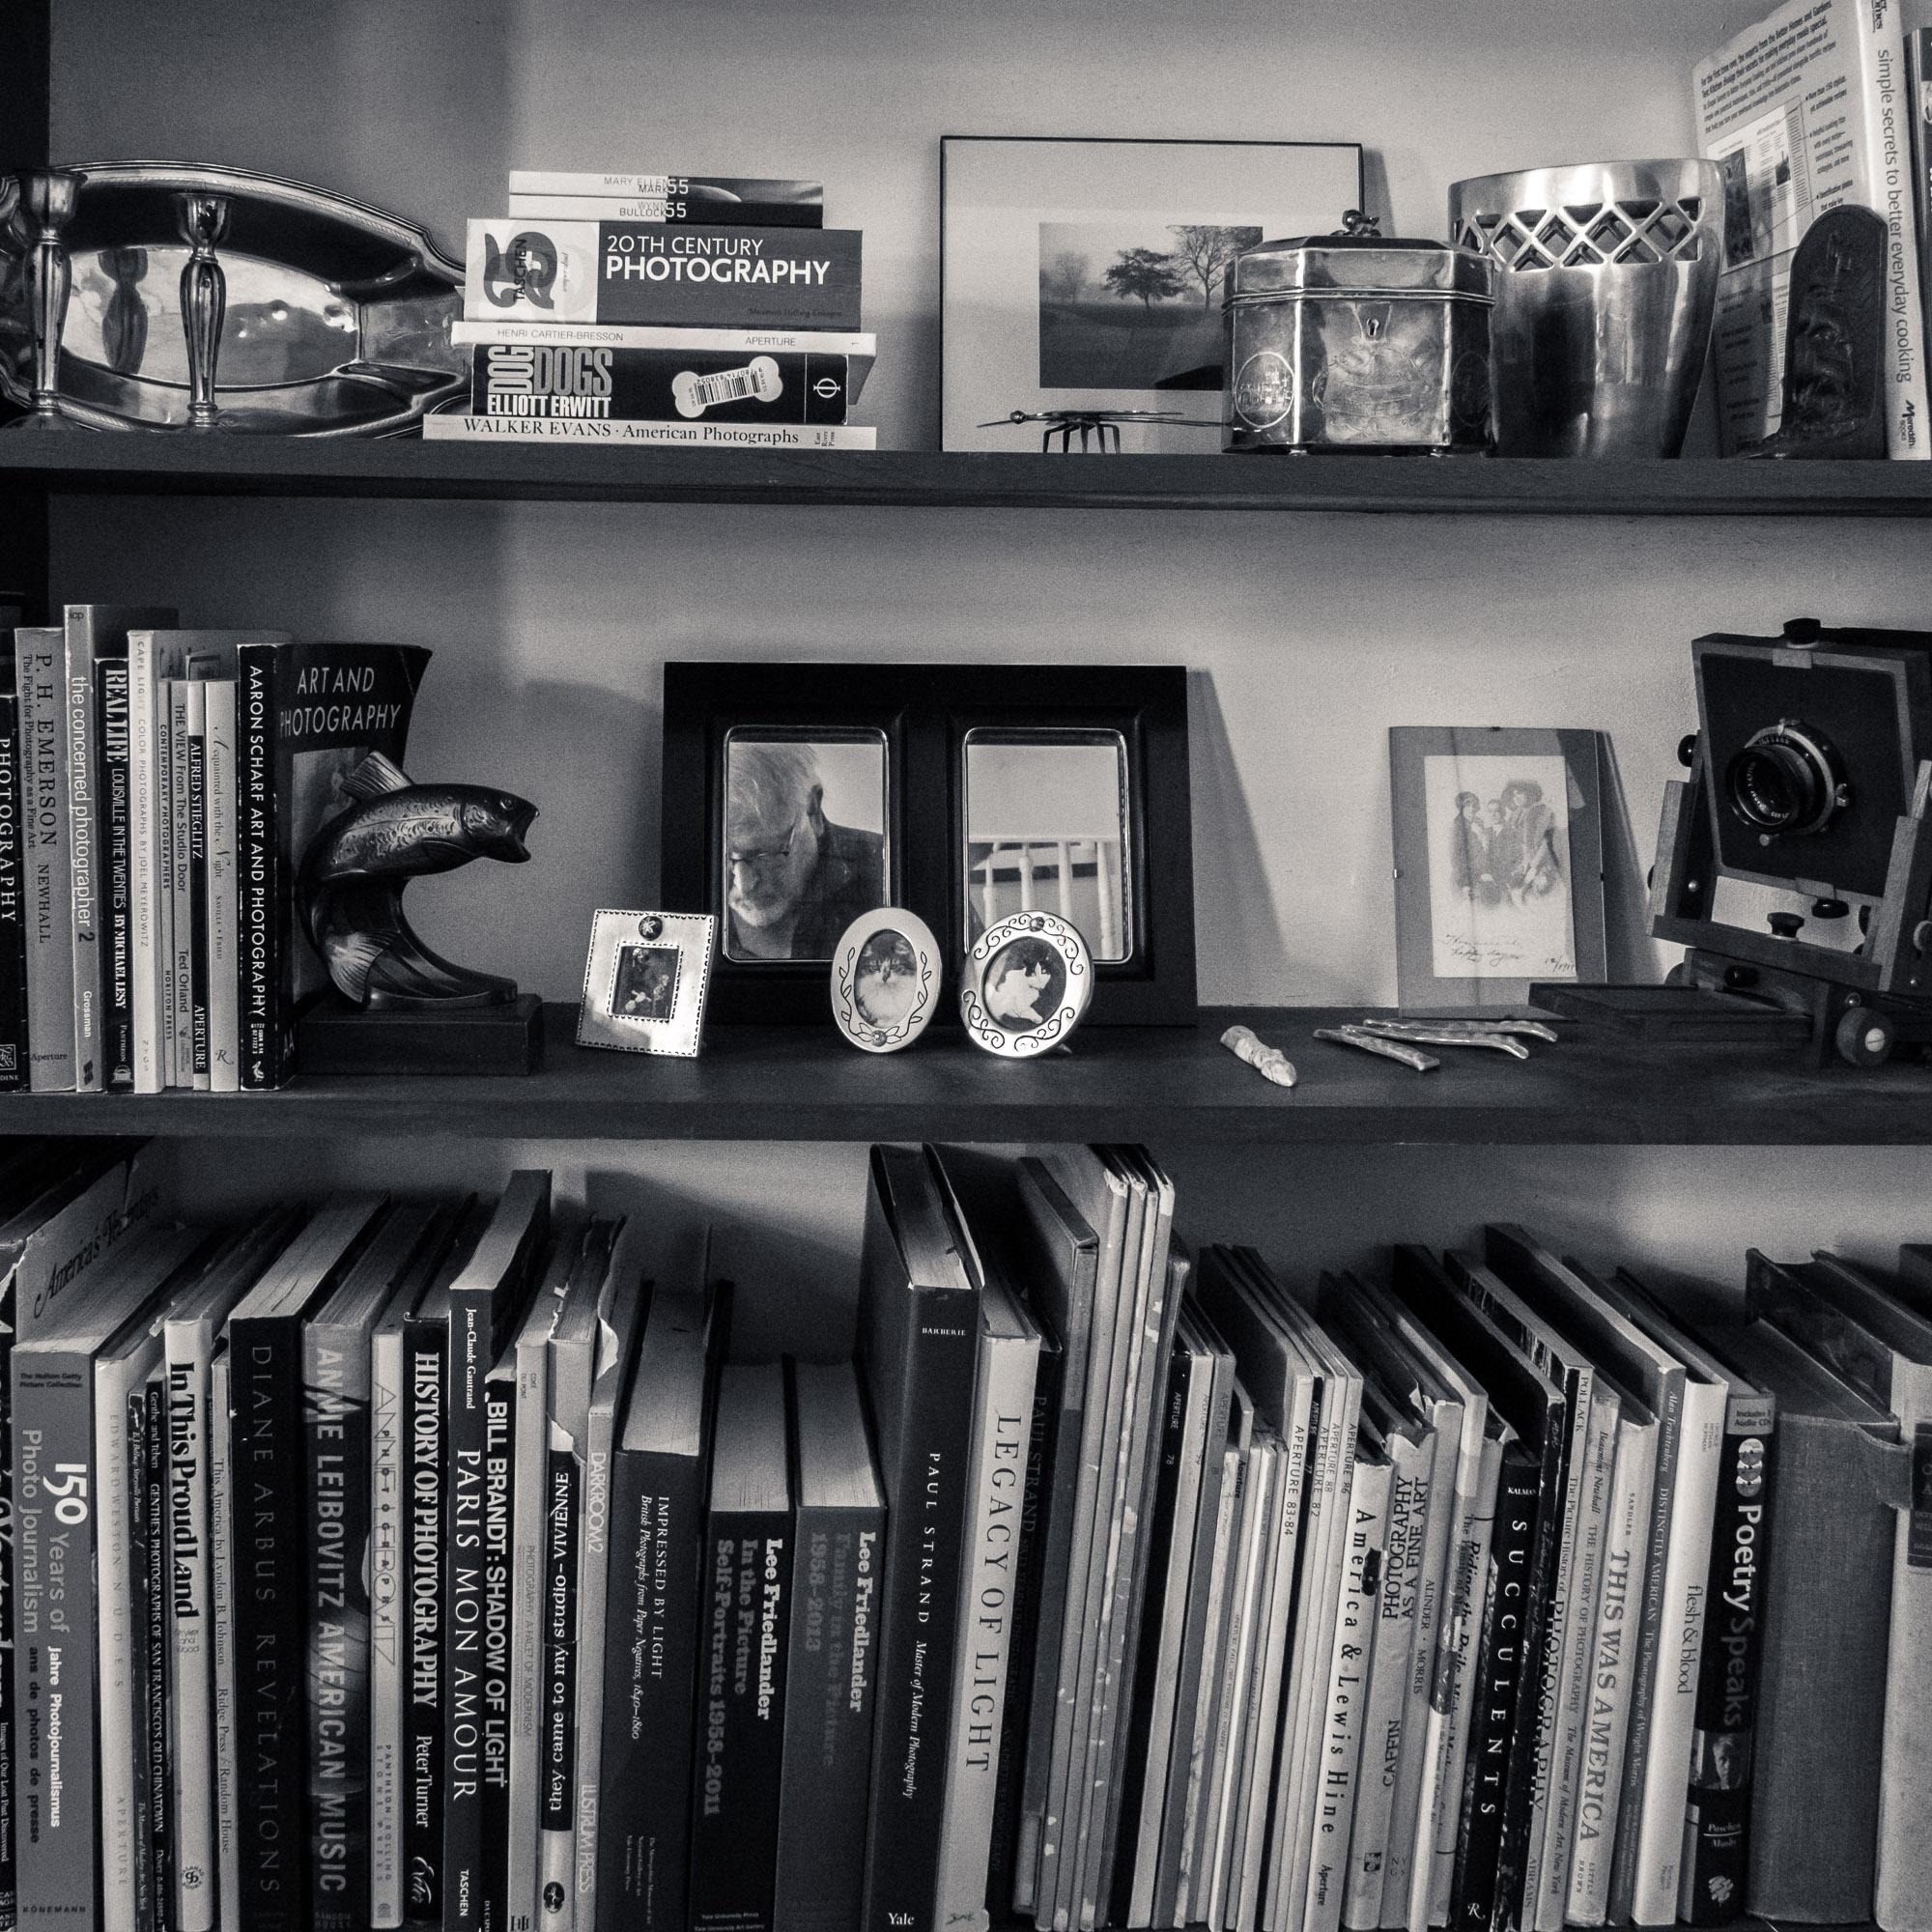 Nick Van Zanten 's photobook library in black-and-white